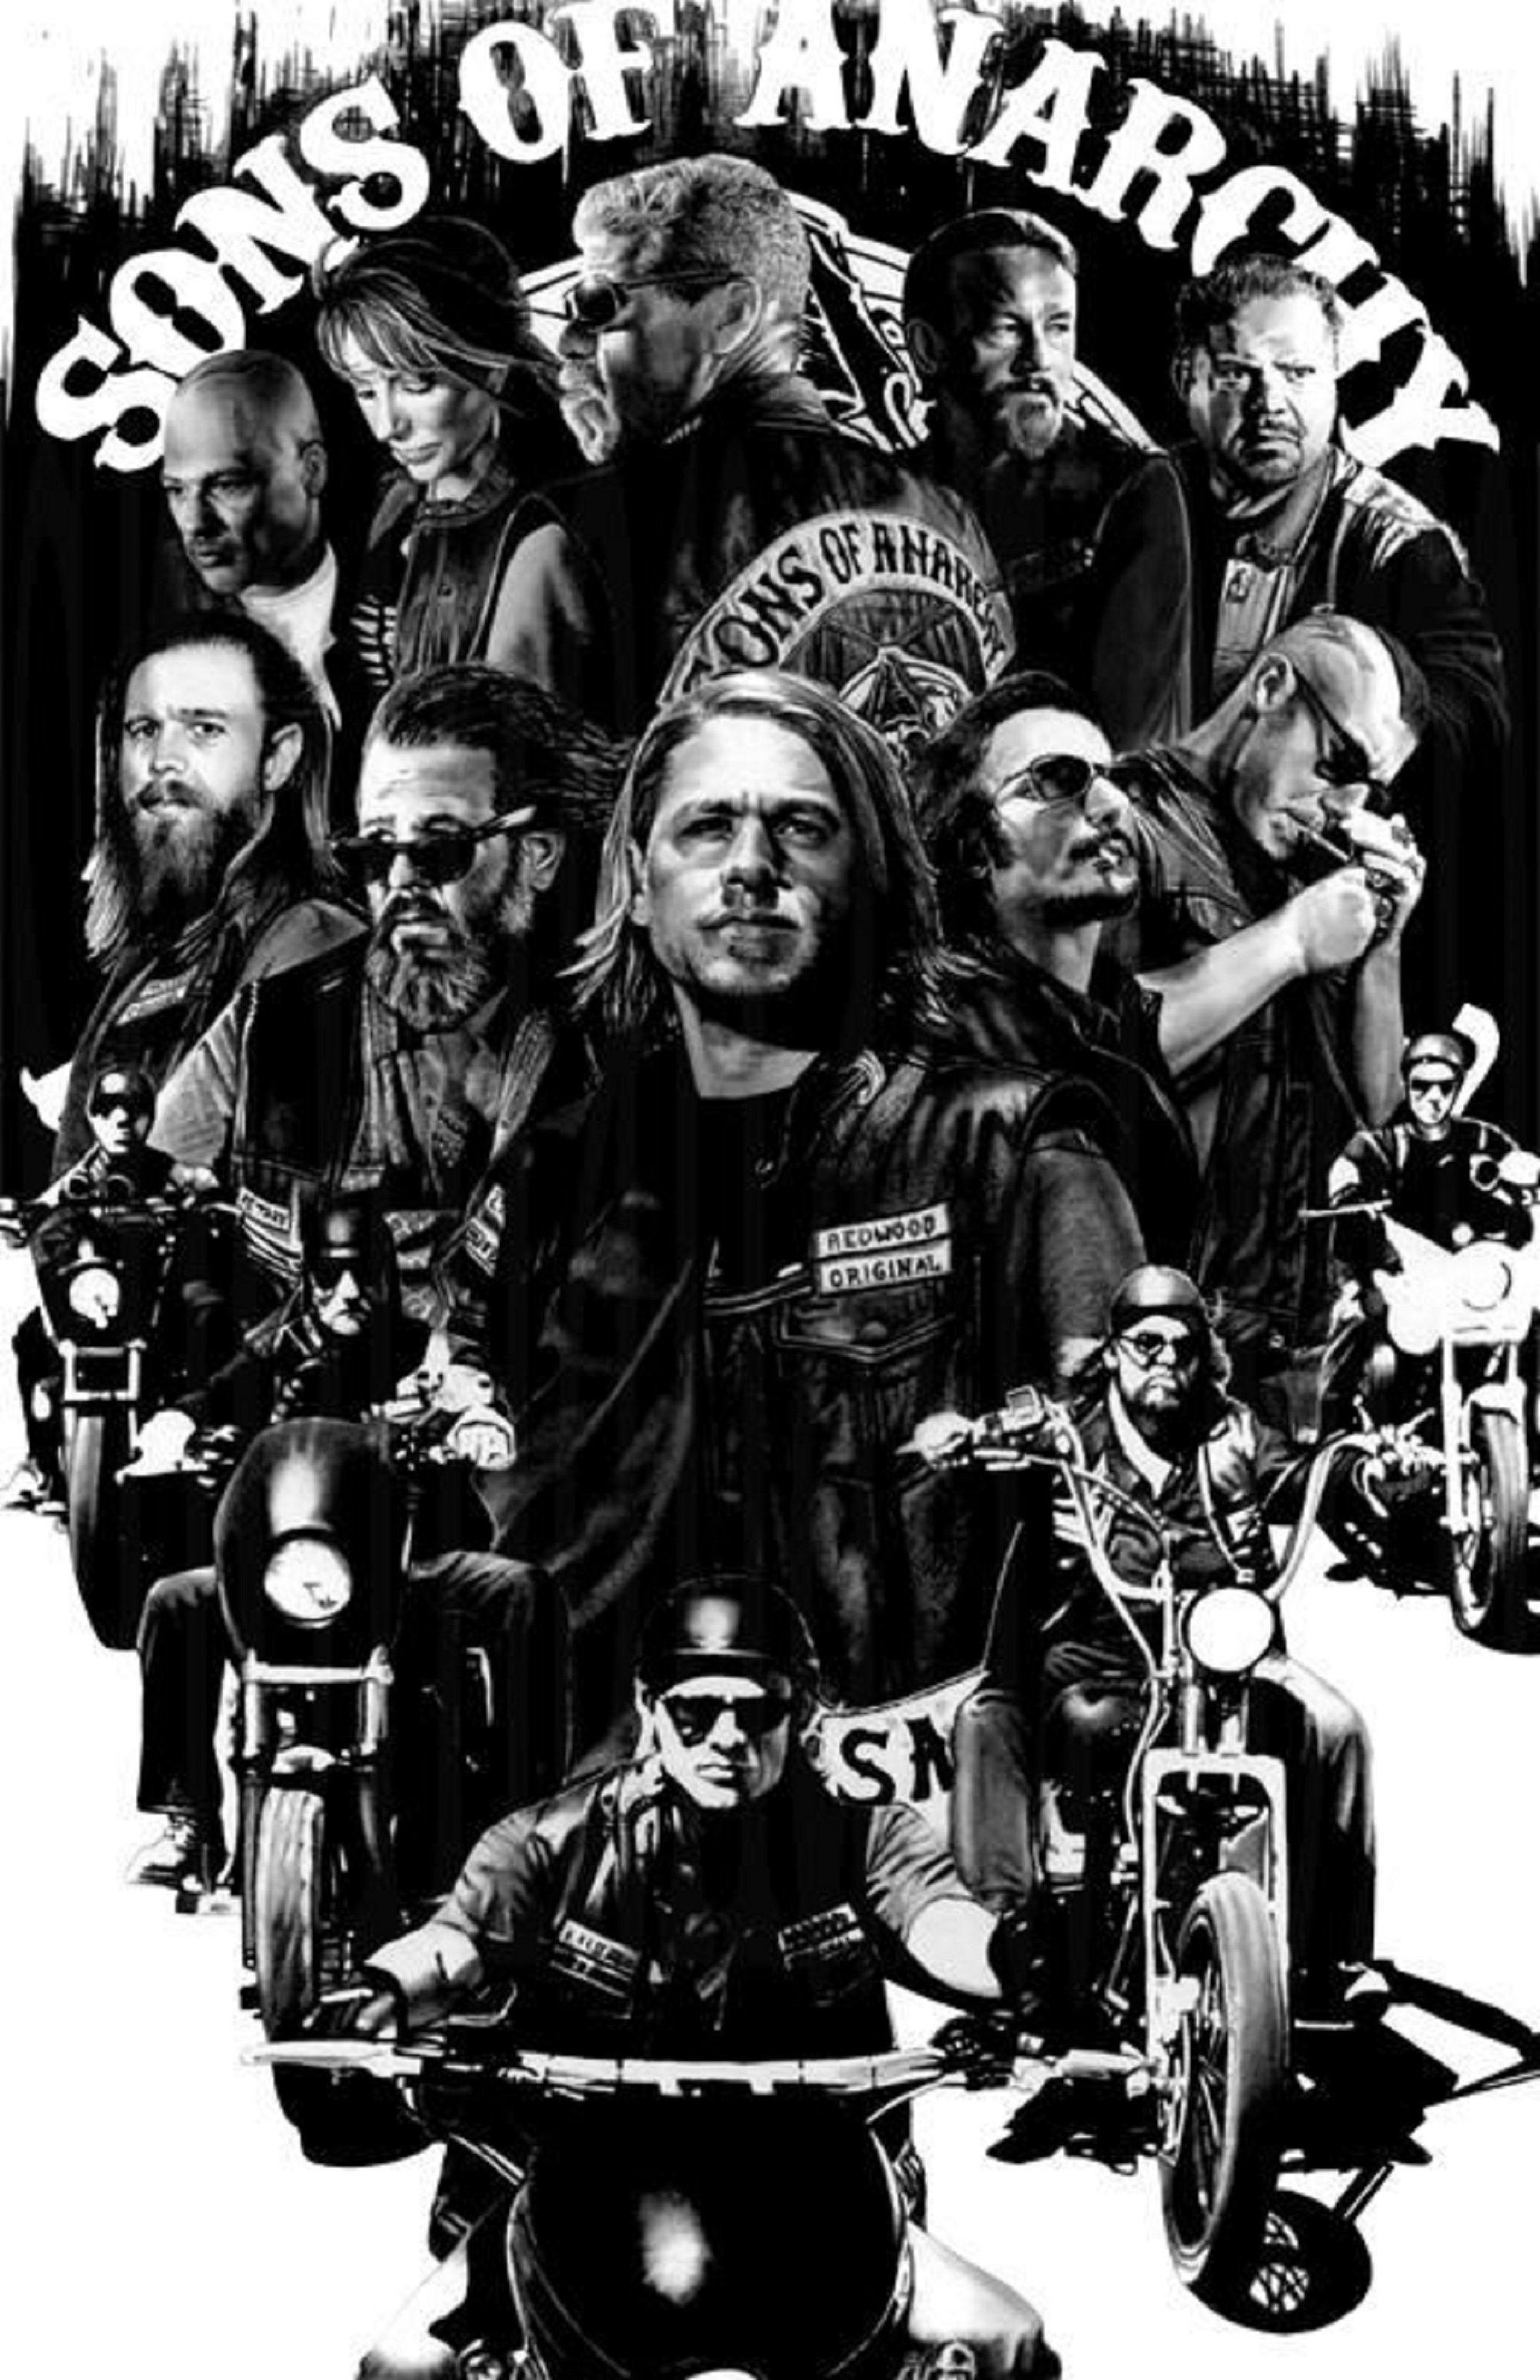 SONS of ANARCHY Sons of anarchy, Sons of anarchy samcro